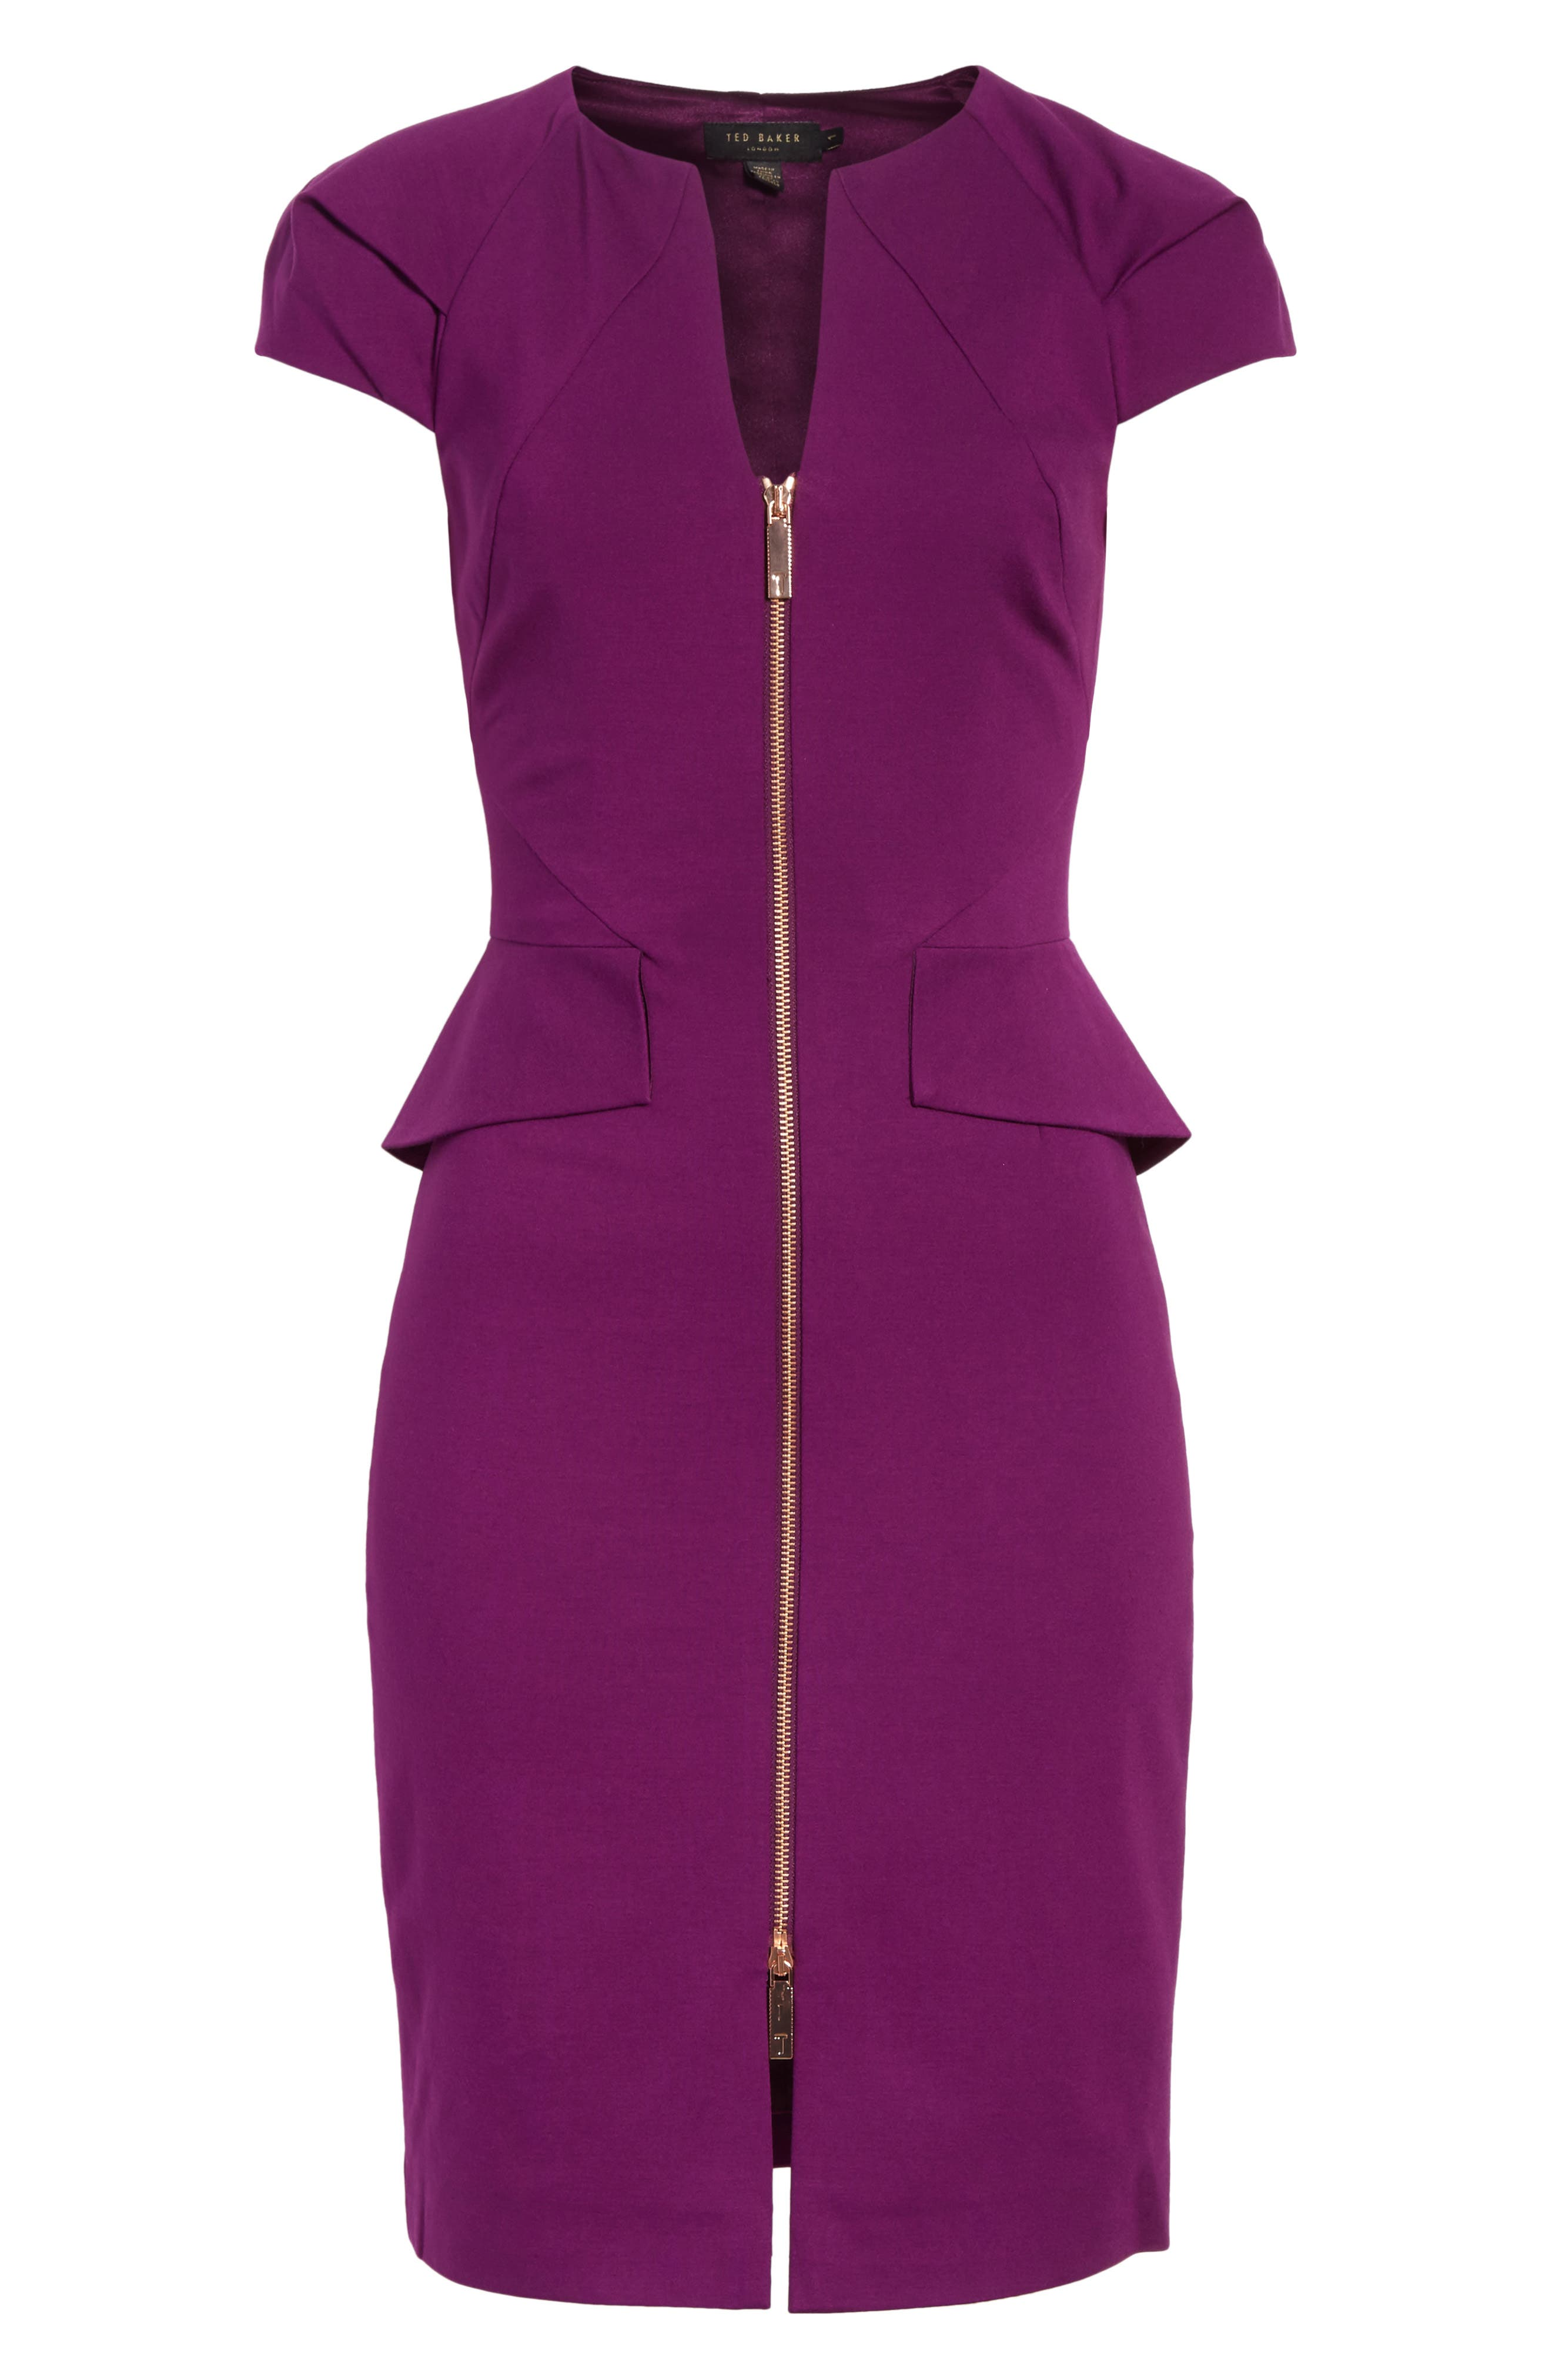 Fidelle Structured Peplum Dress,                             Alternate thumbnail 6, color,                             Deep Purple